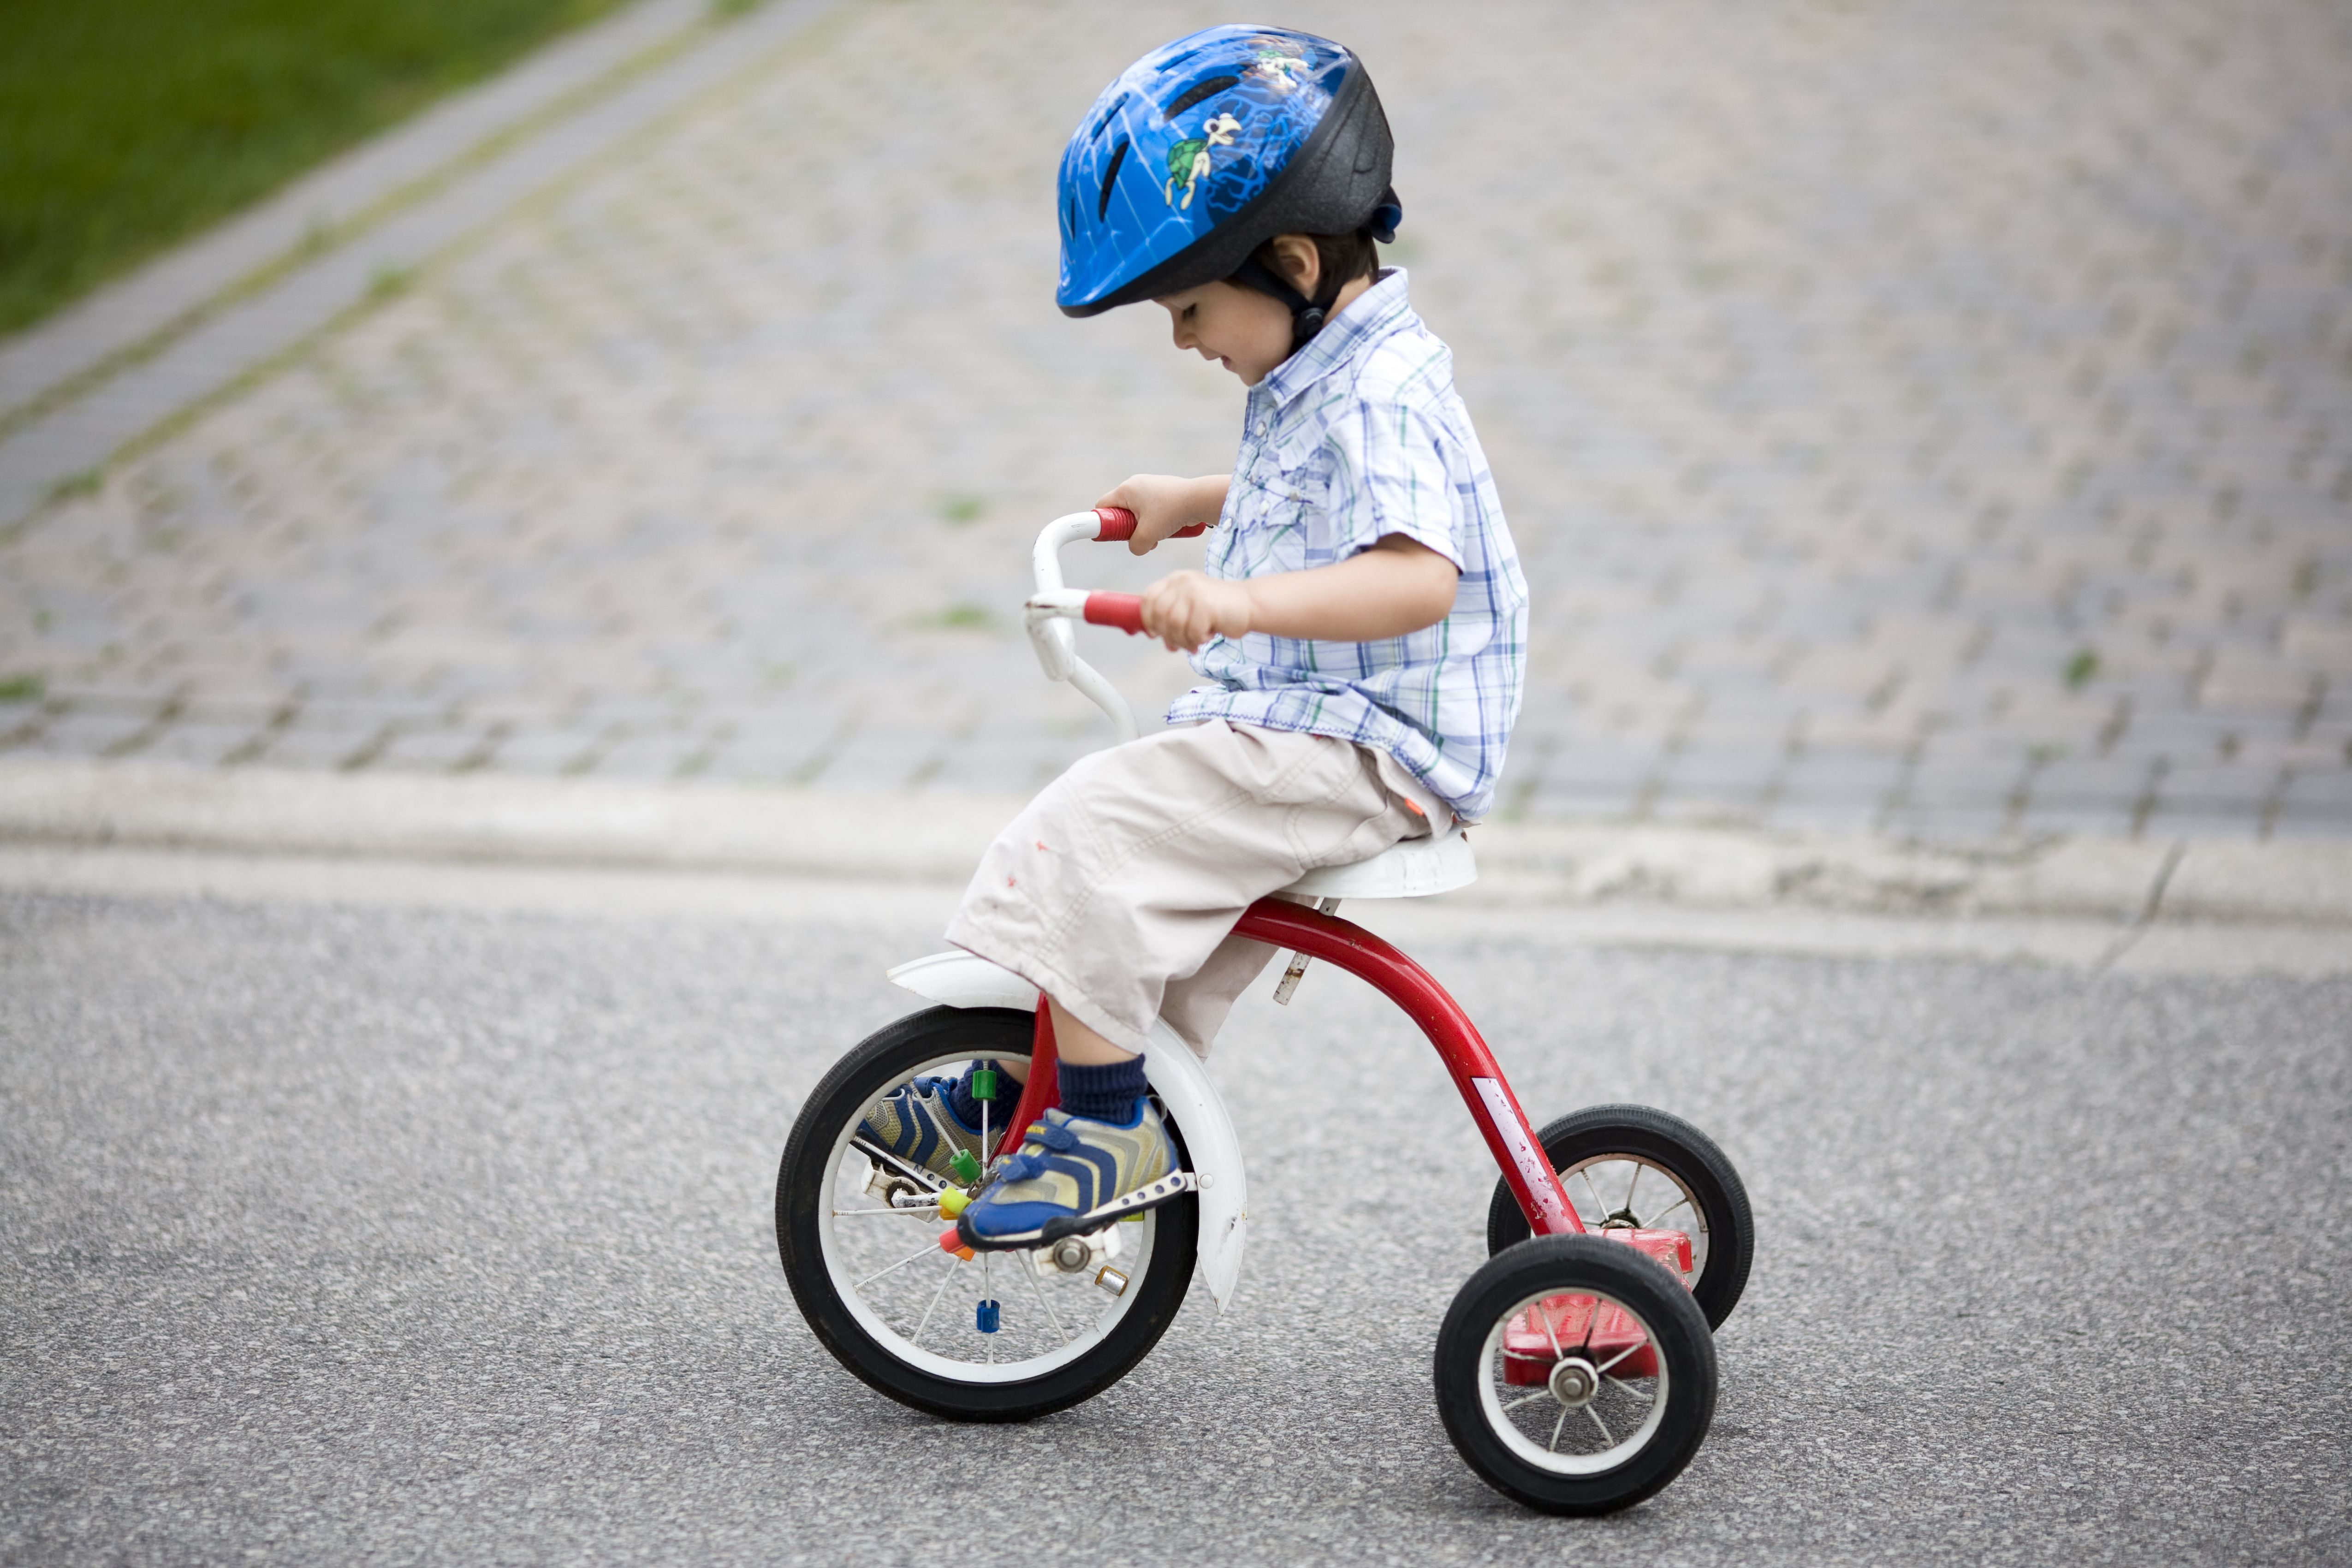 Little boy wearing helmet rides tricycle